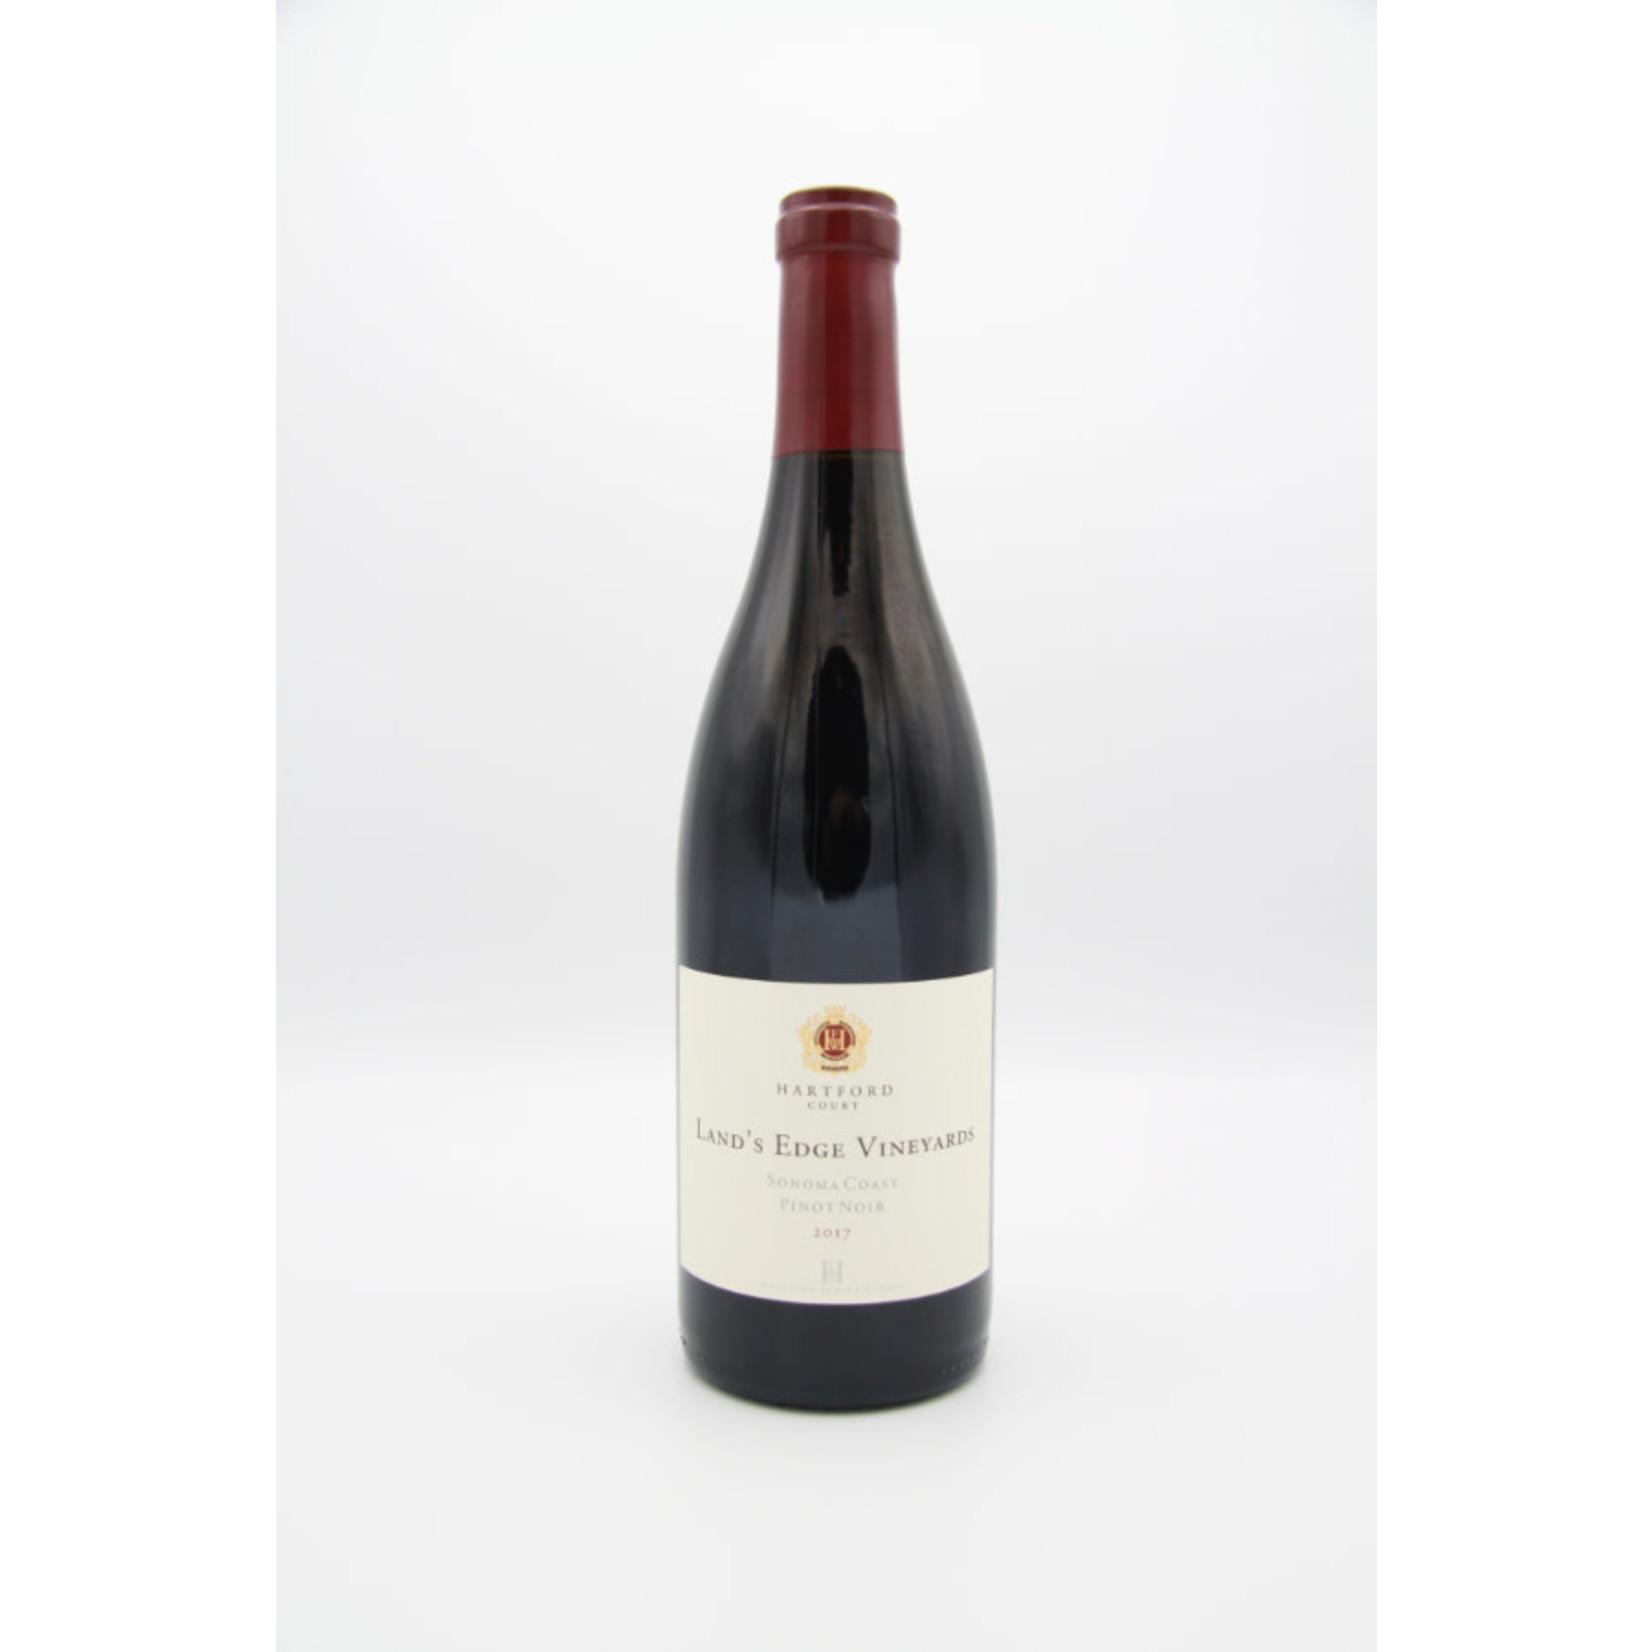 2017 Hartford Court 'Land's Edge Vineyards' Pinot Noir